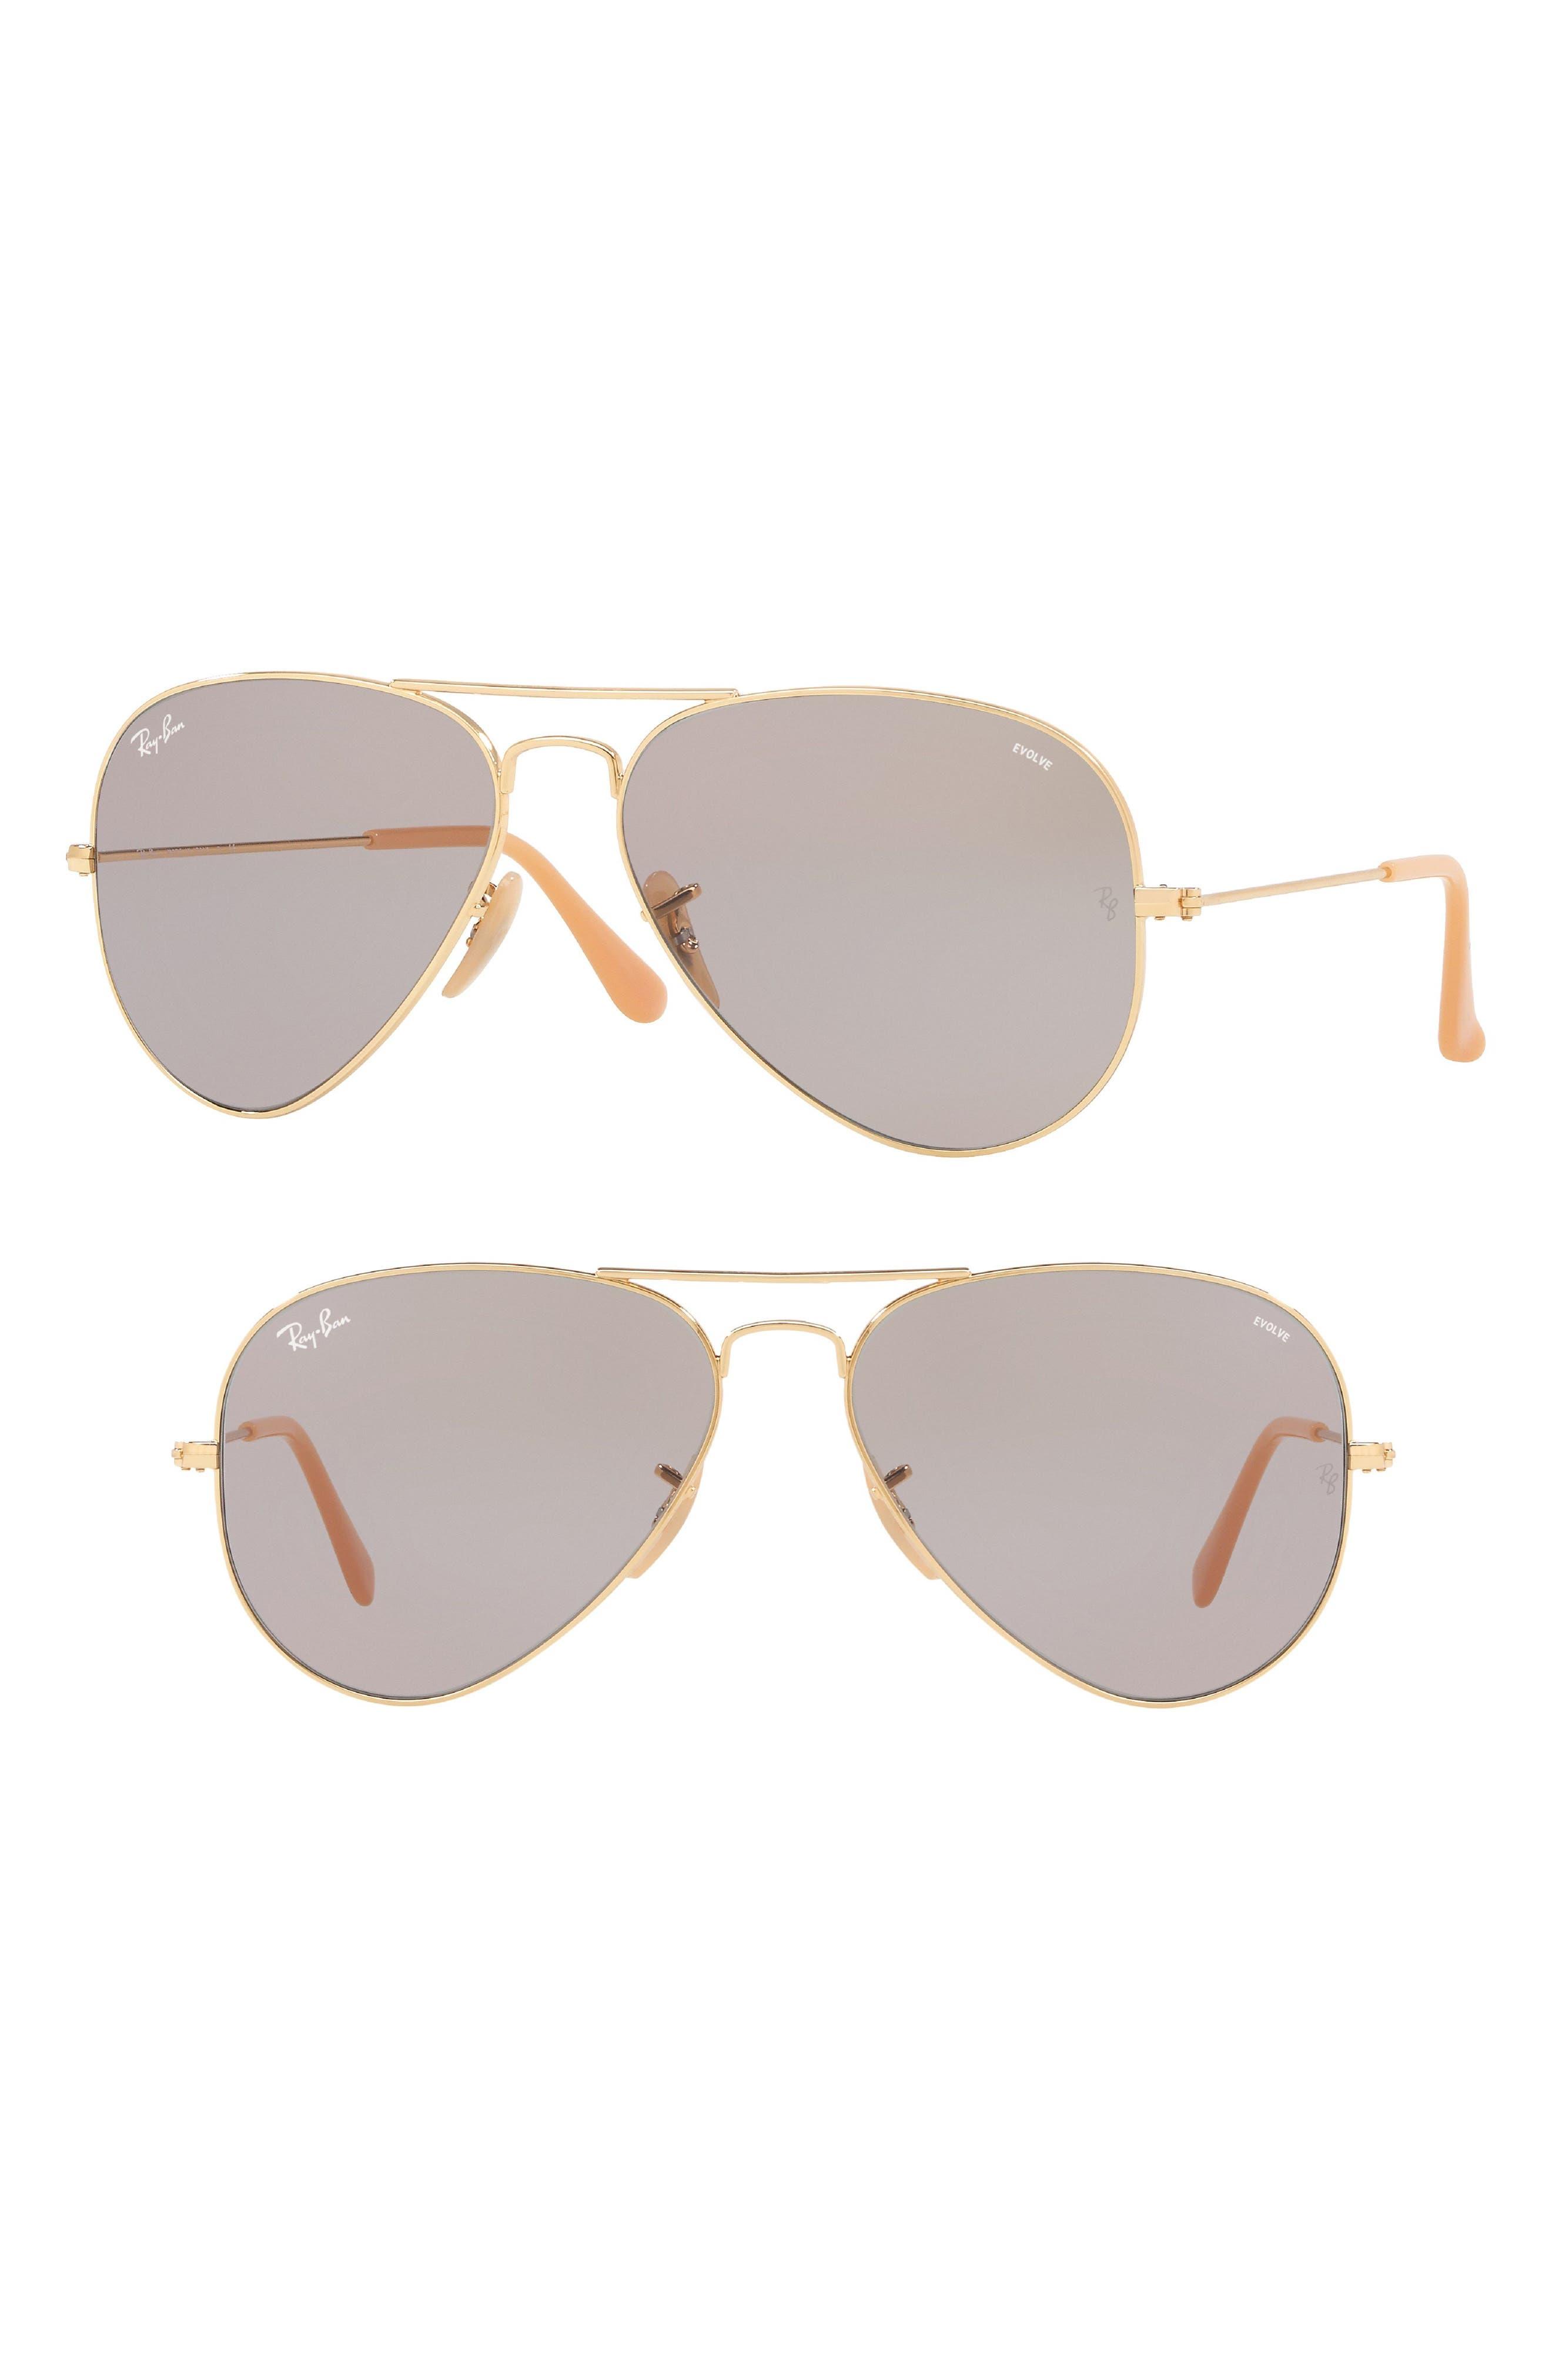 Ray-Ban 58mm Polarized Photochromic Aviator Sunglasses